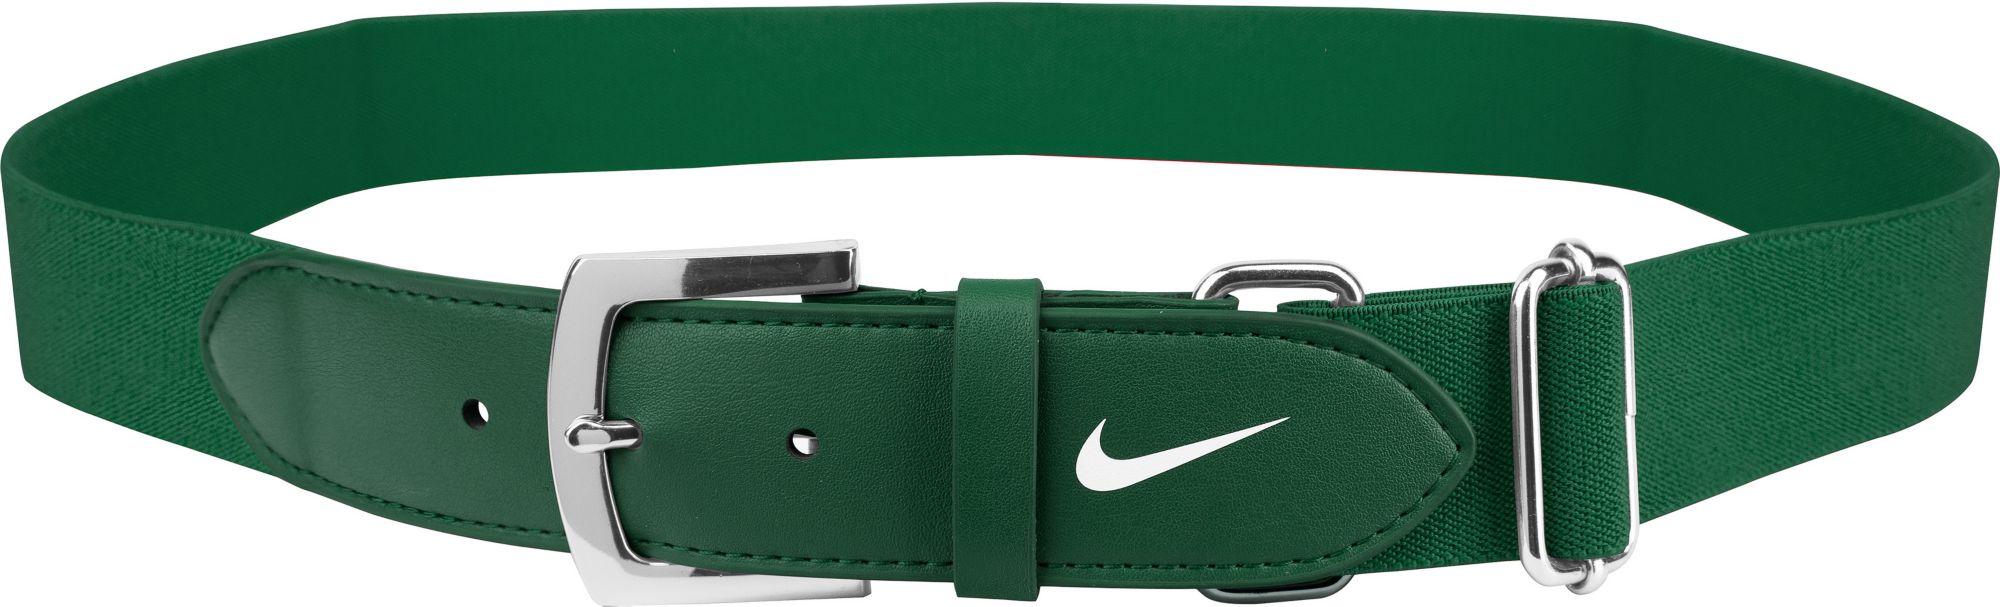 Nike Youth Leather Baseball Belt DICKS Sporting Goods